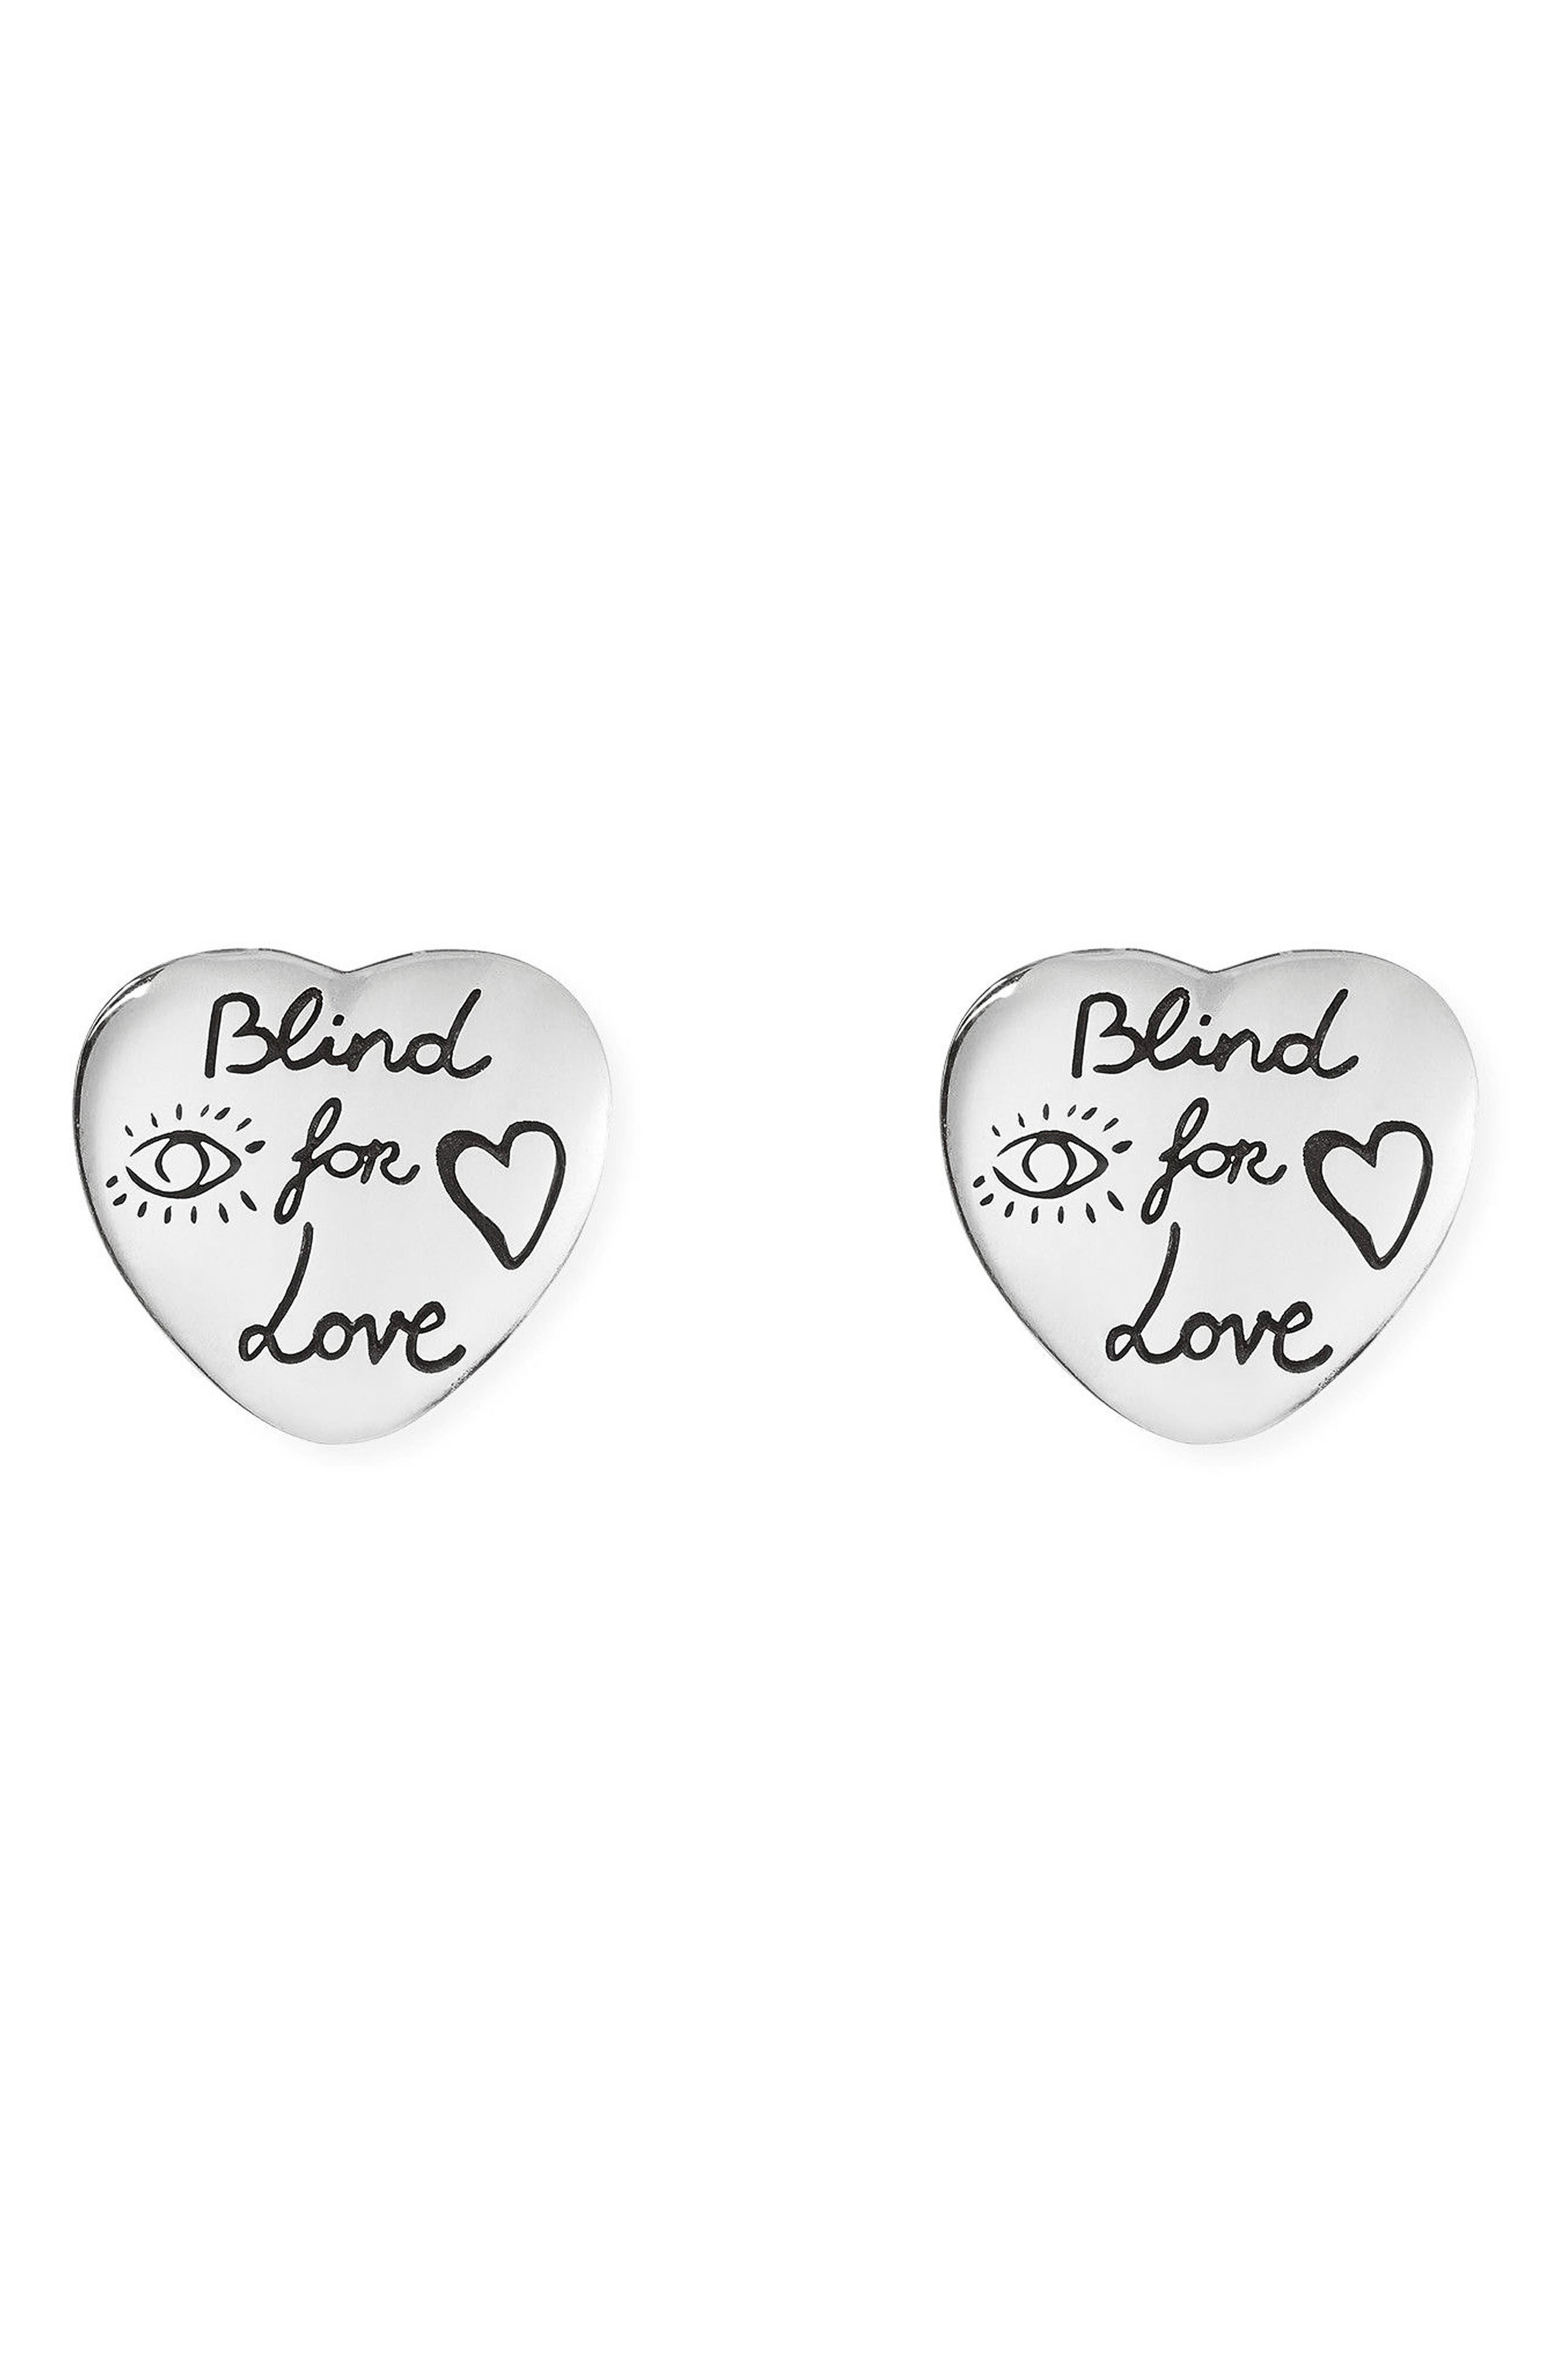 Blind for Love Stud Earrings,                         Main,                         color, Sterling Silver